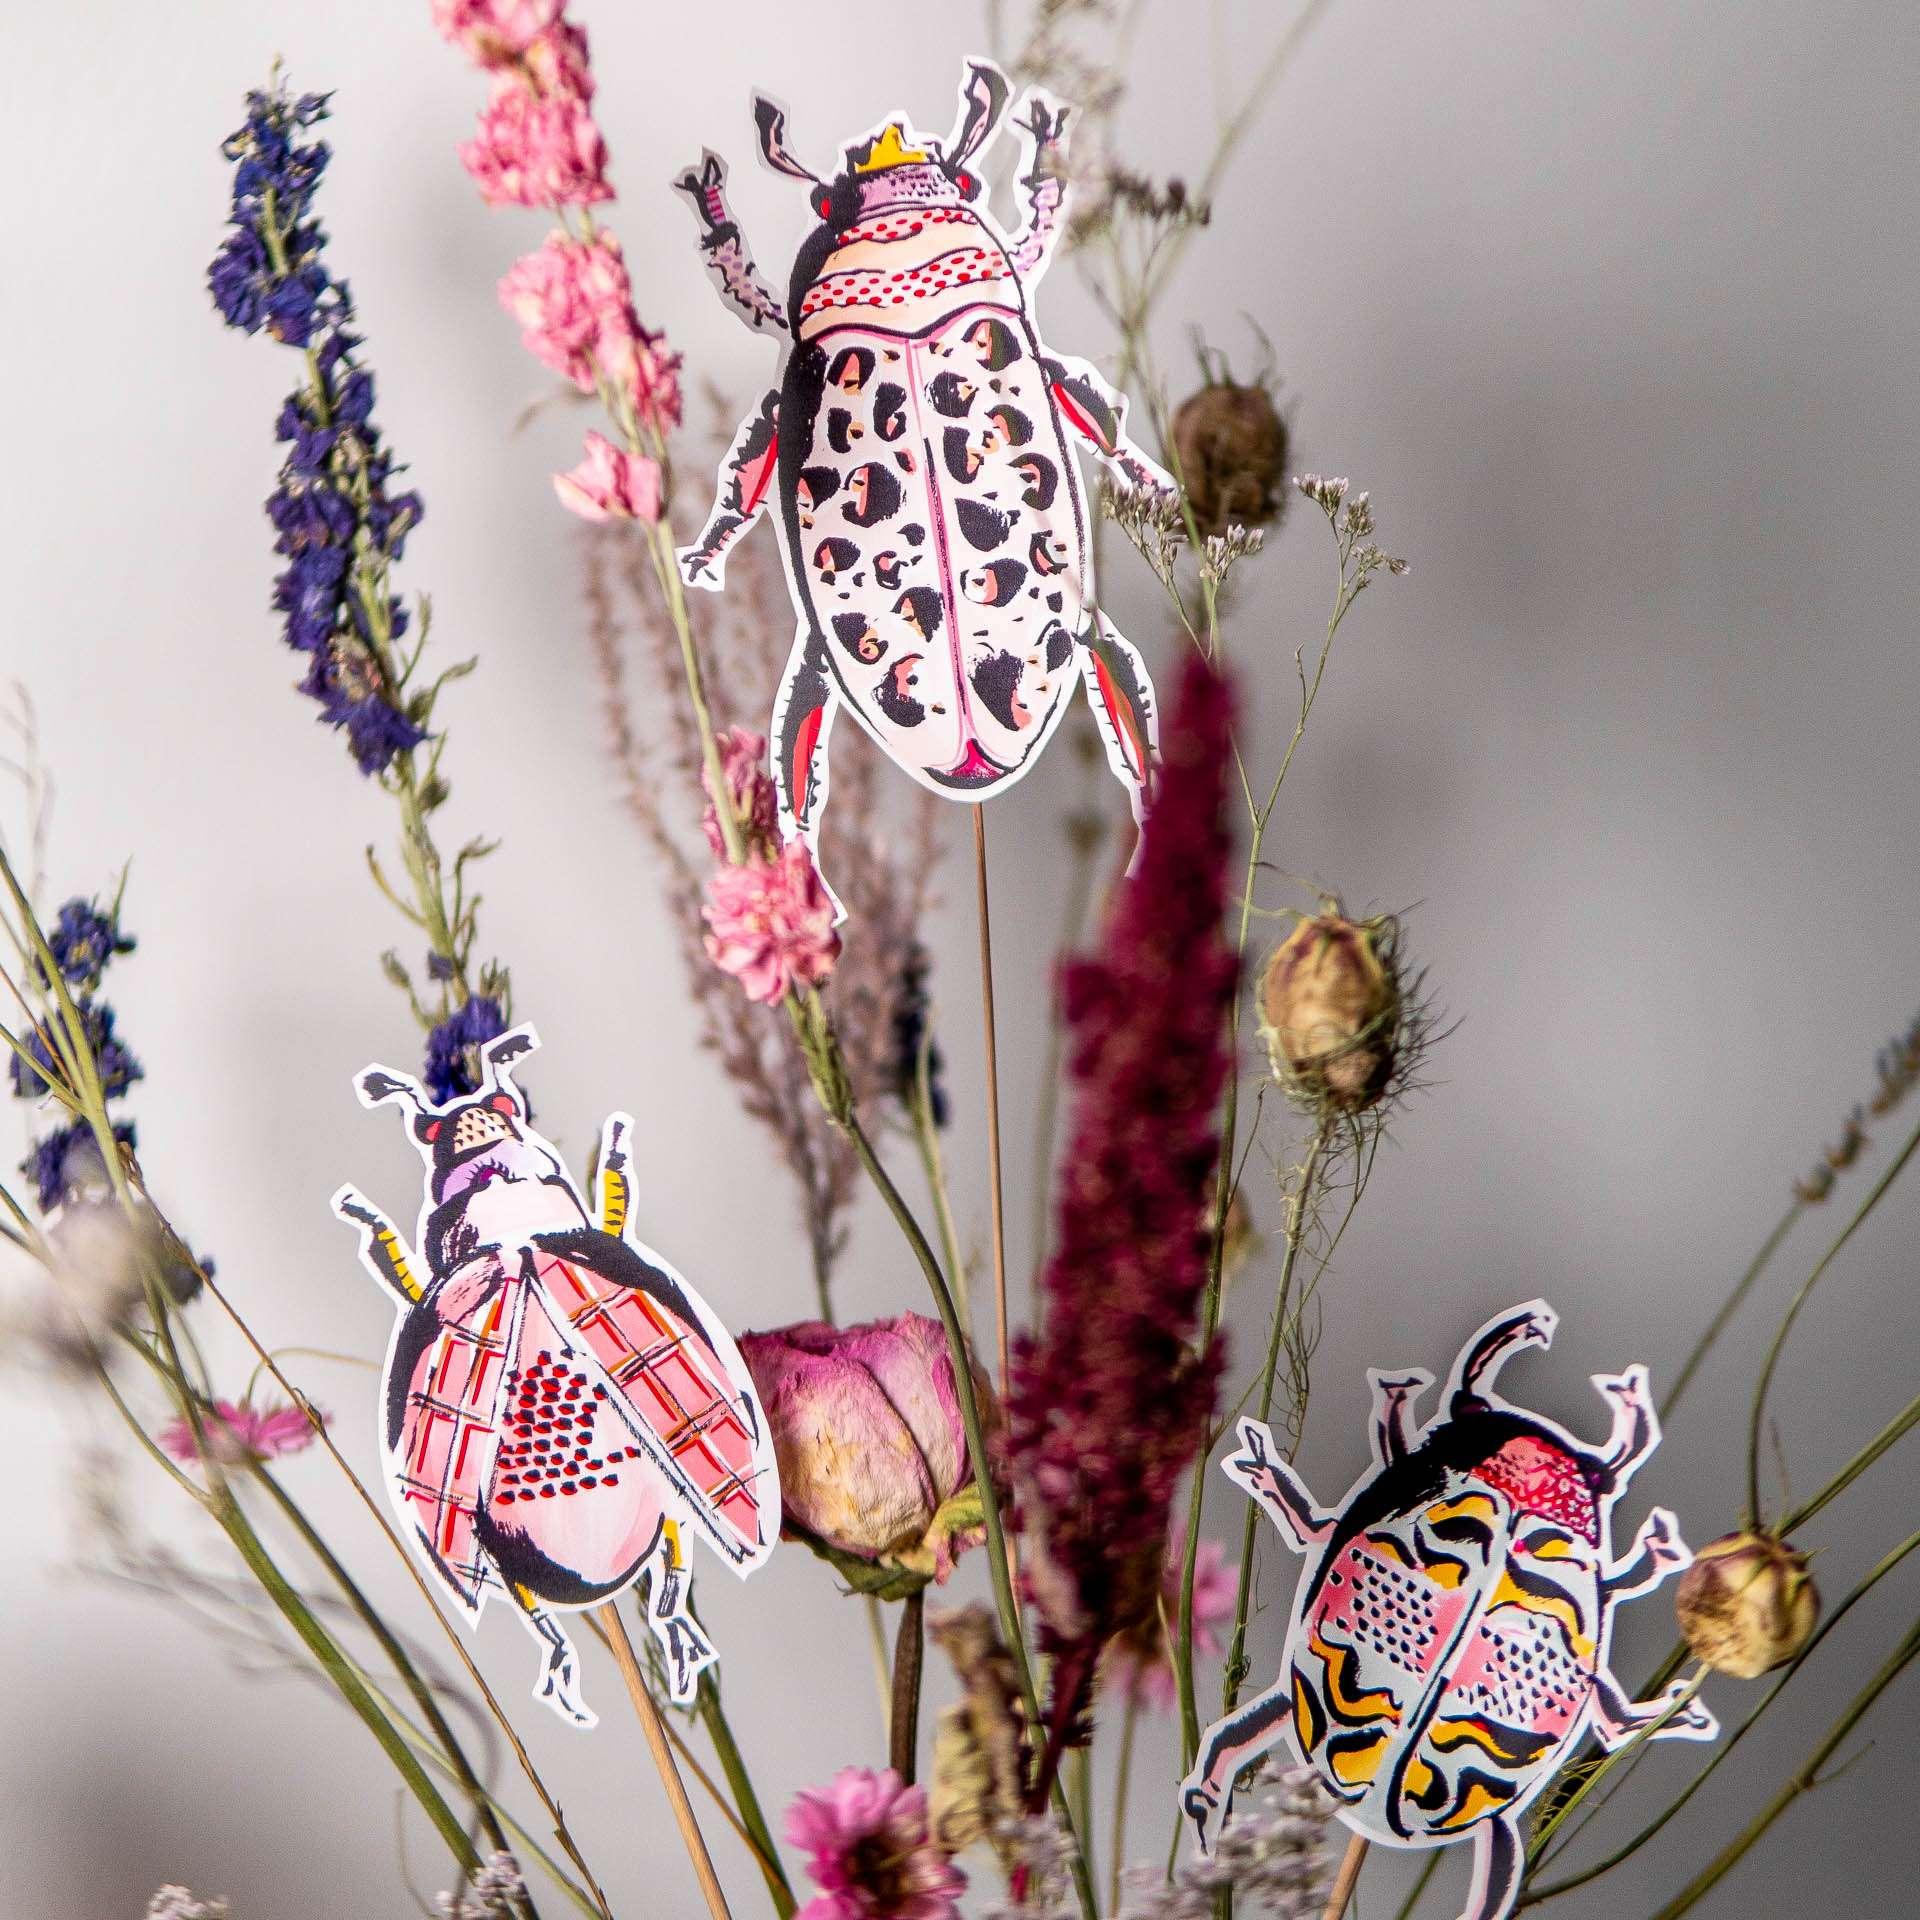 Nadja König Trockenblumen Frühlingsdeko